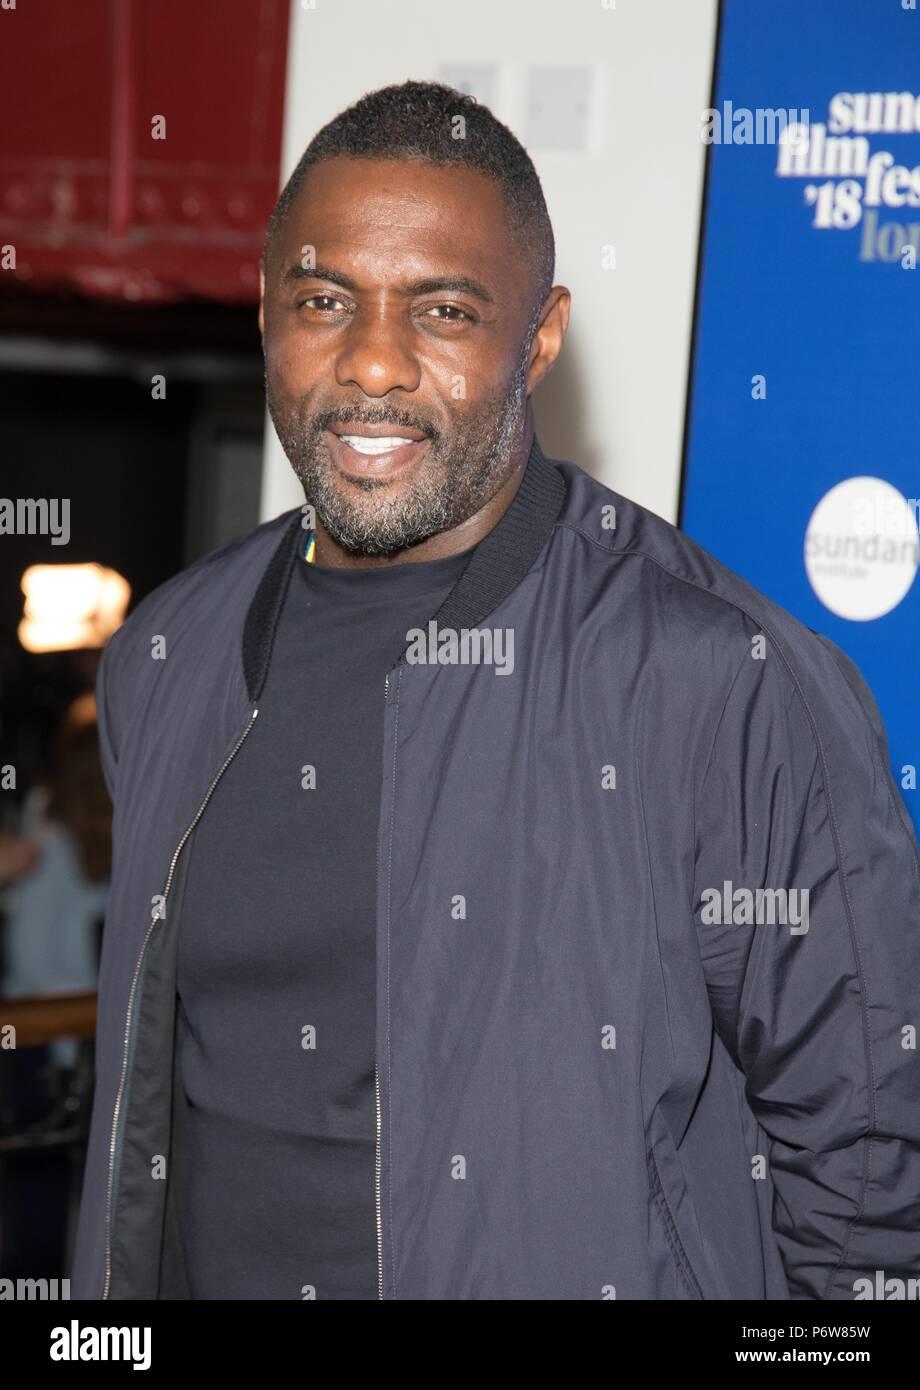 6bb9d1f19015 Sundance Film Festival -  Yardie  - Premiere Featuring  Idris Elba Where   London